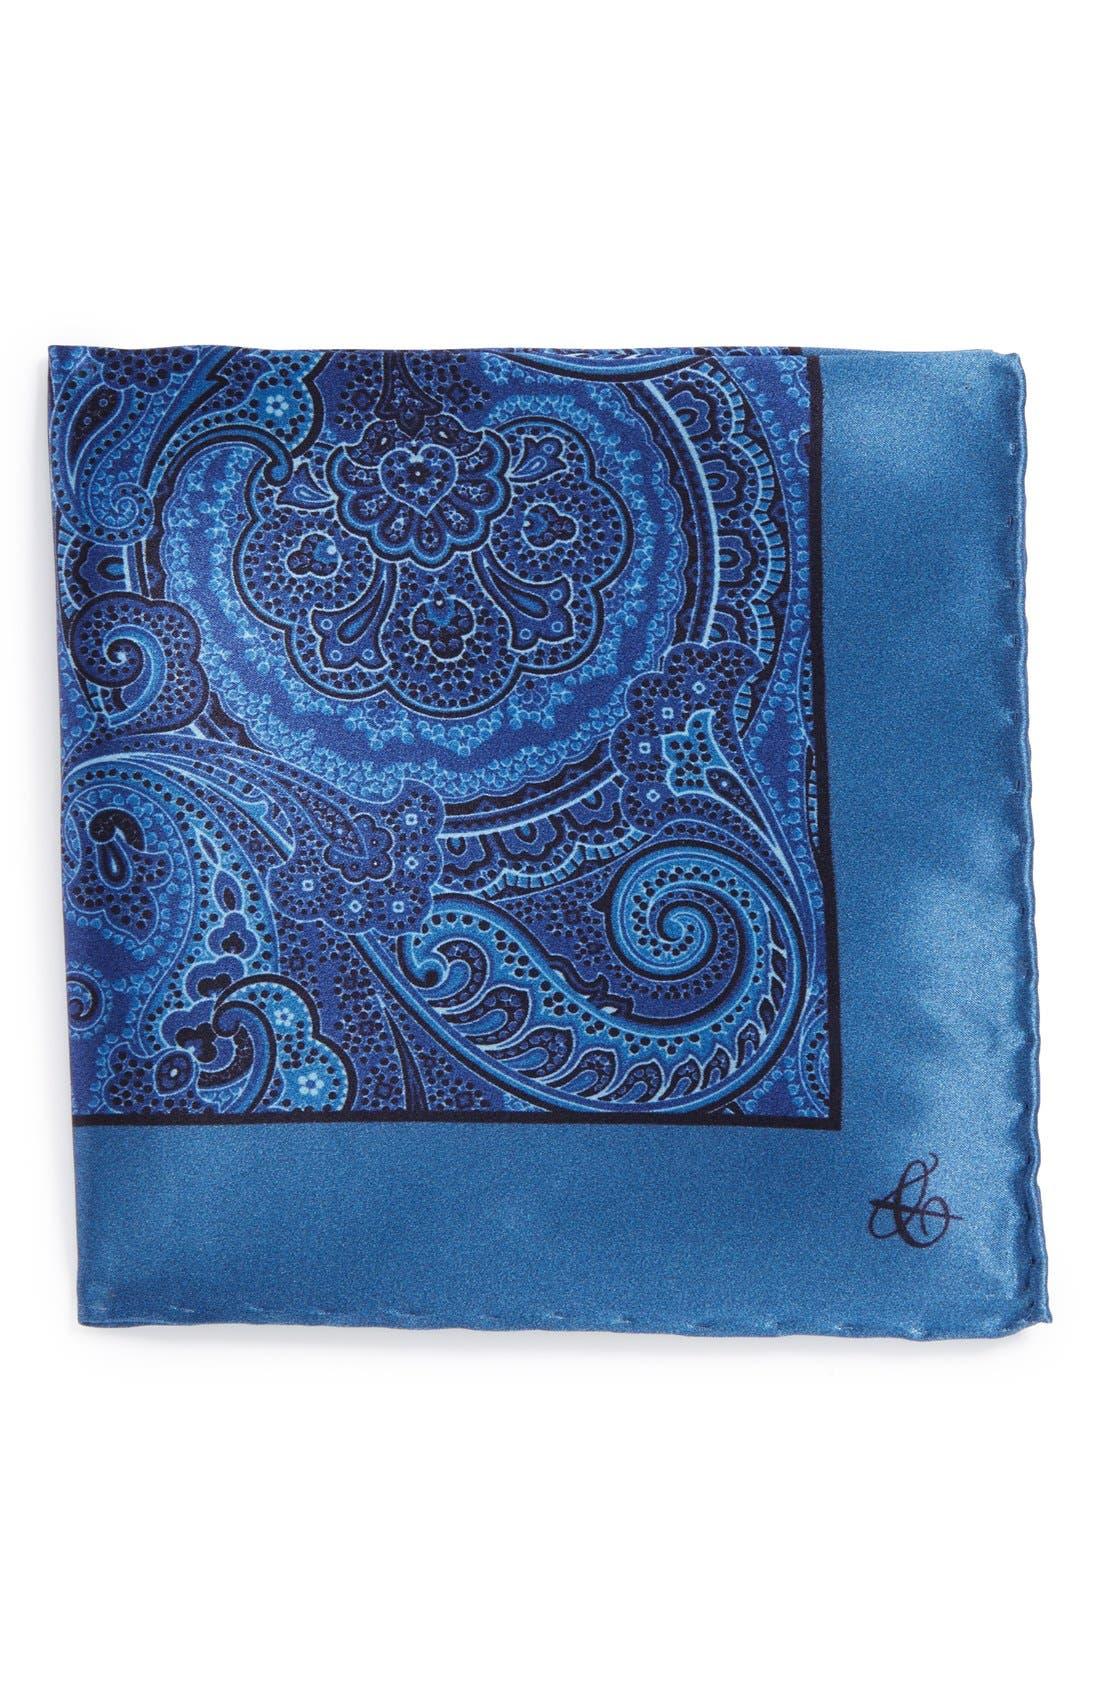 Alternate Image 1 Selected - Canali Silk Pocket Square